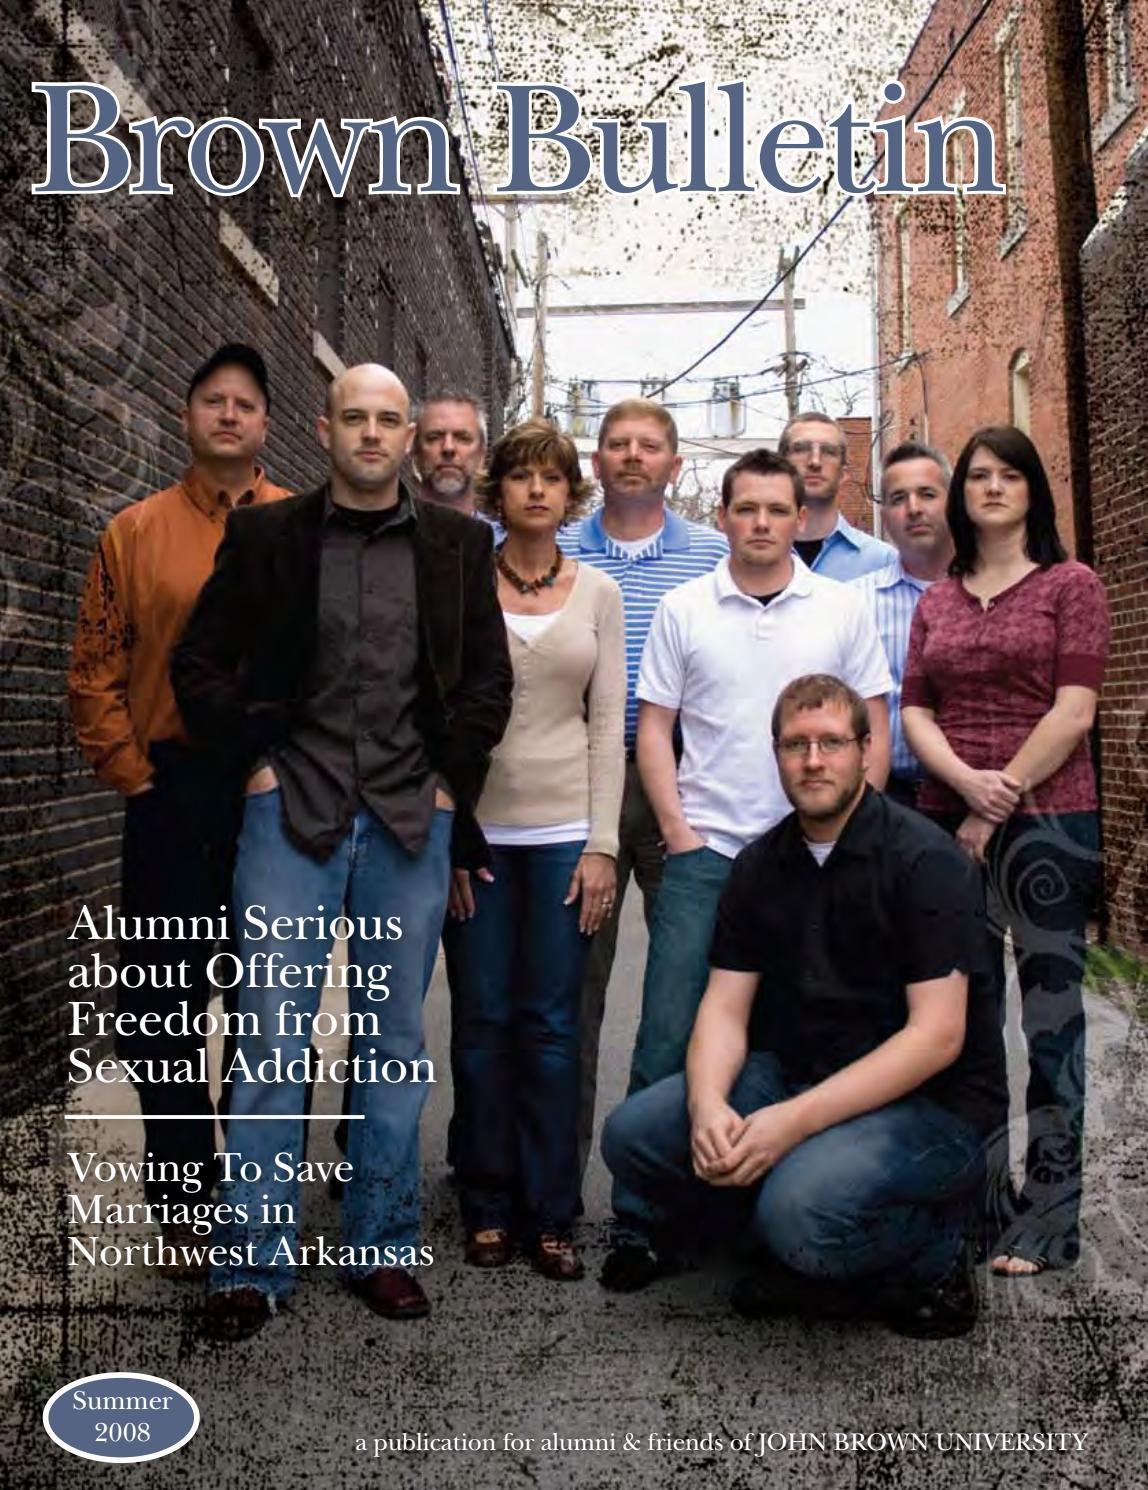 Brown Bulletin - Summer 2008 by John Brown University - issuu